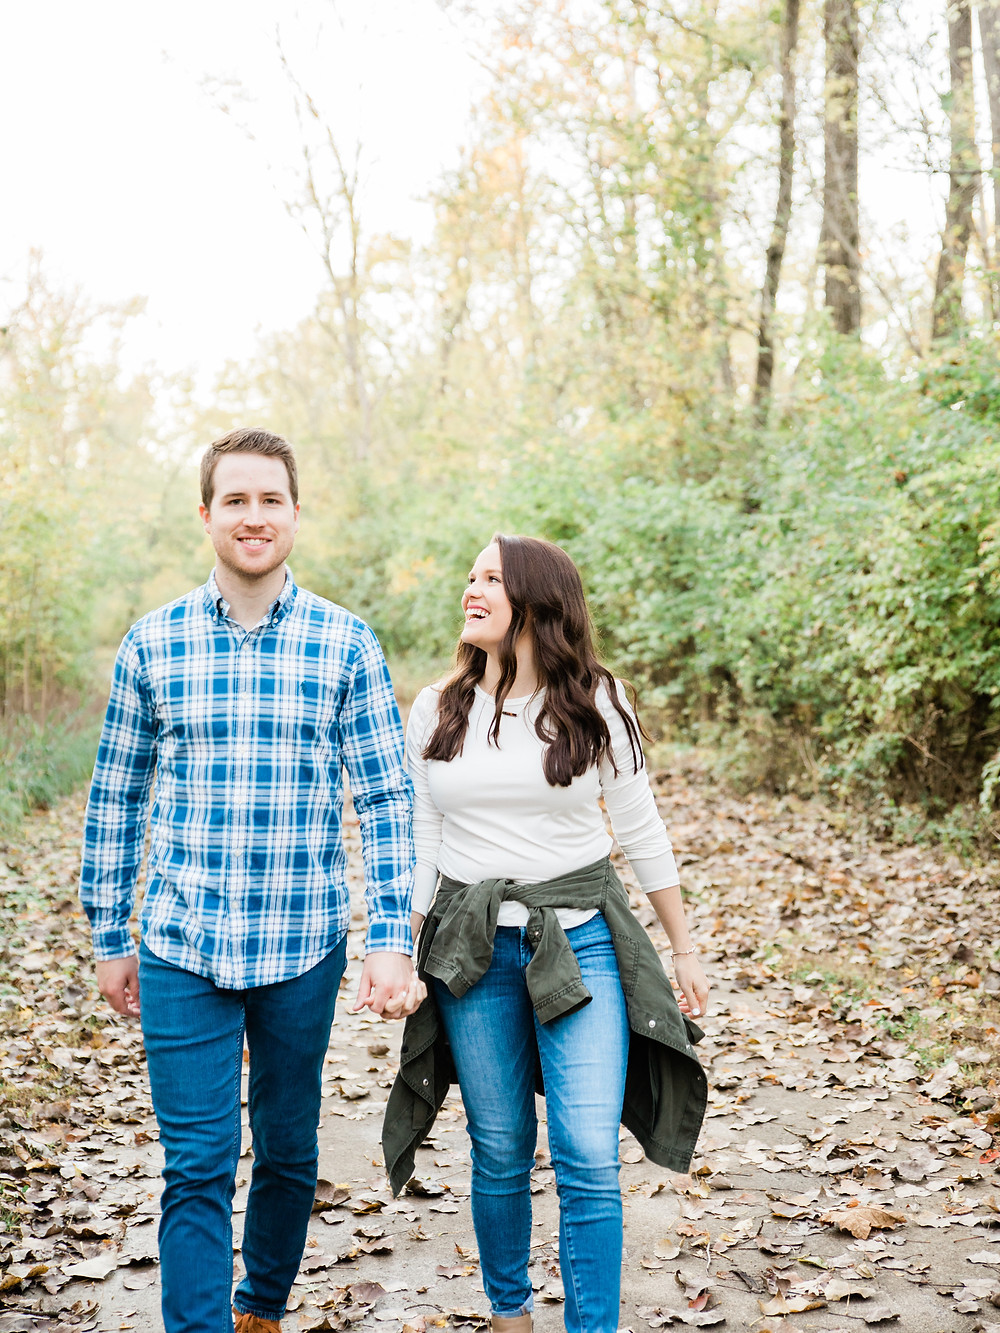 Eureka Missouri Engagement Session | St. Louis Missouri Wedding Photographer | Forest Engagement Session